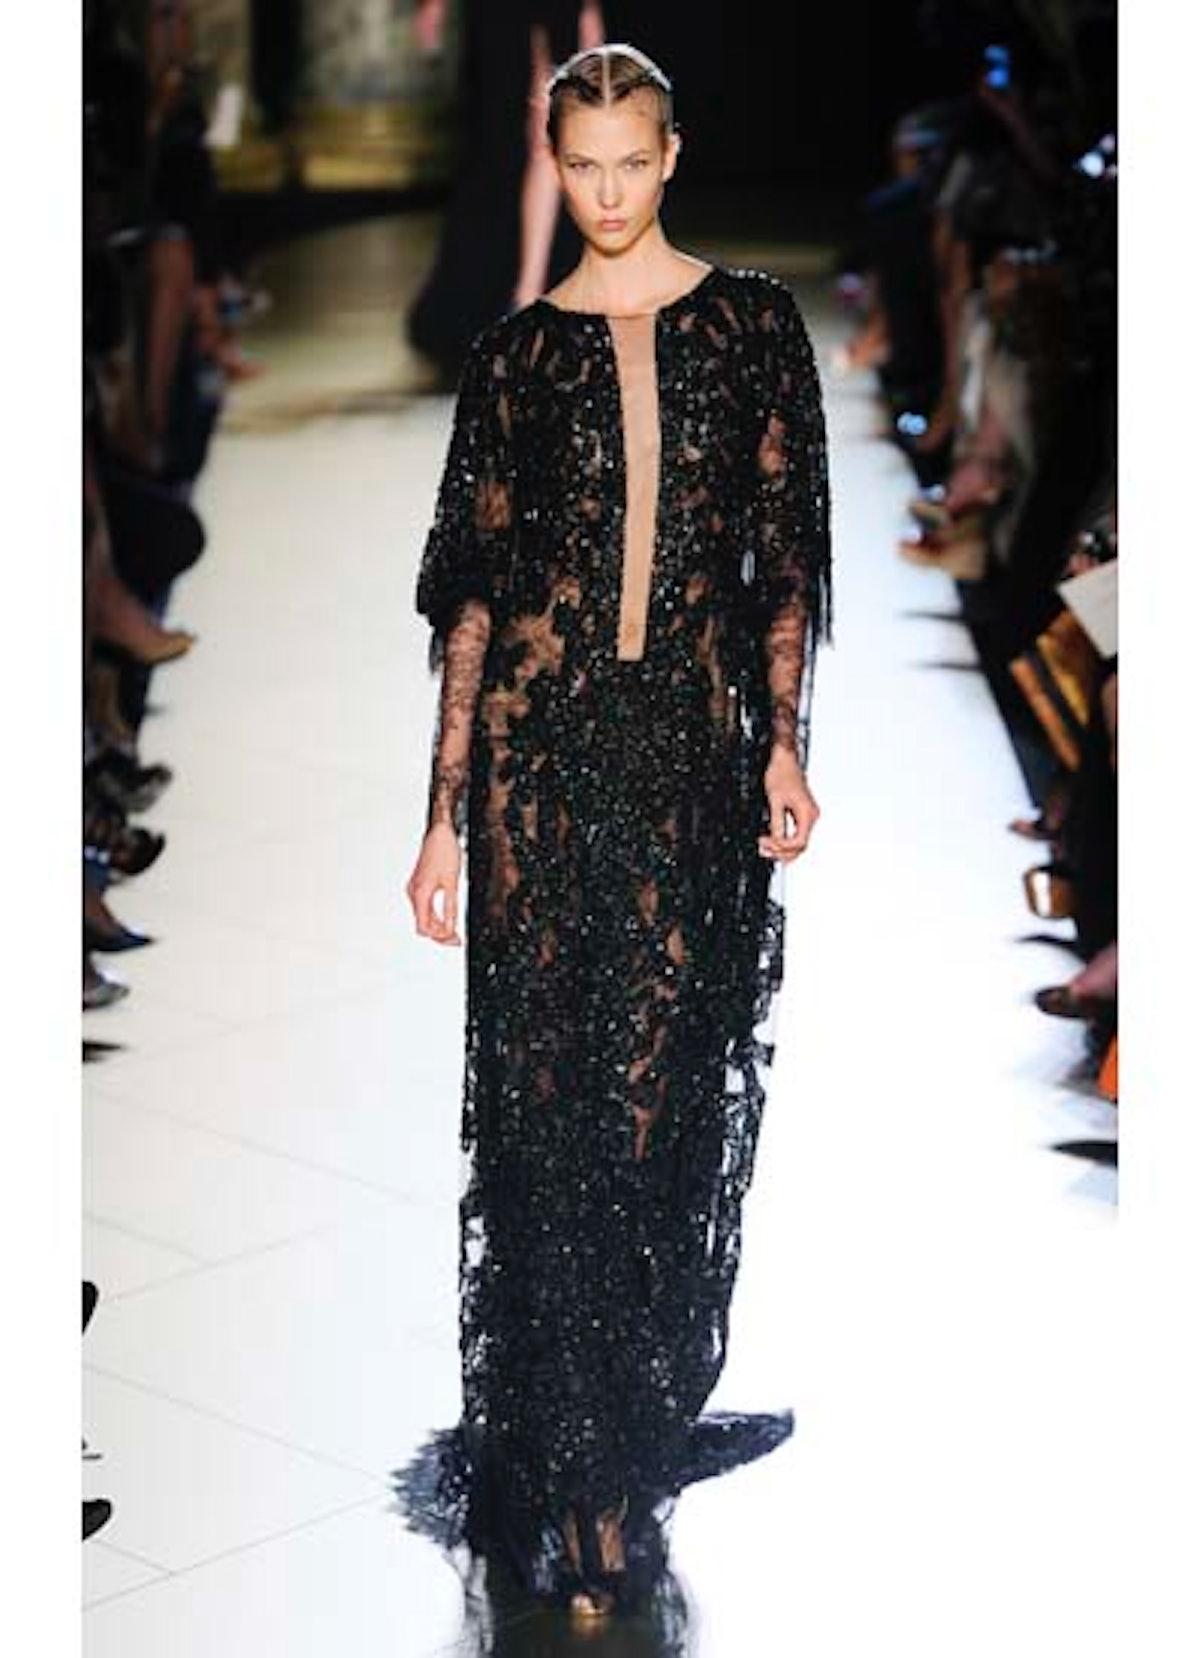 fass-elie-saab-couture-2012-runway-01-v.jpg